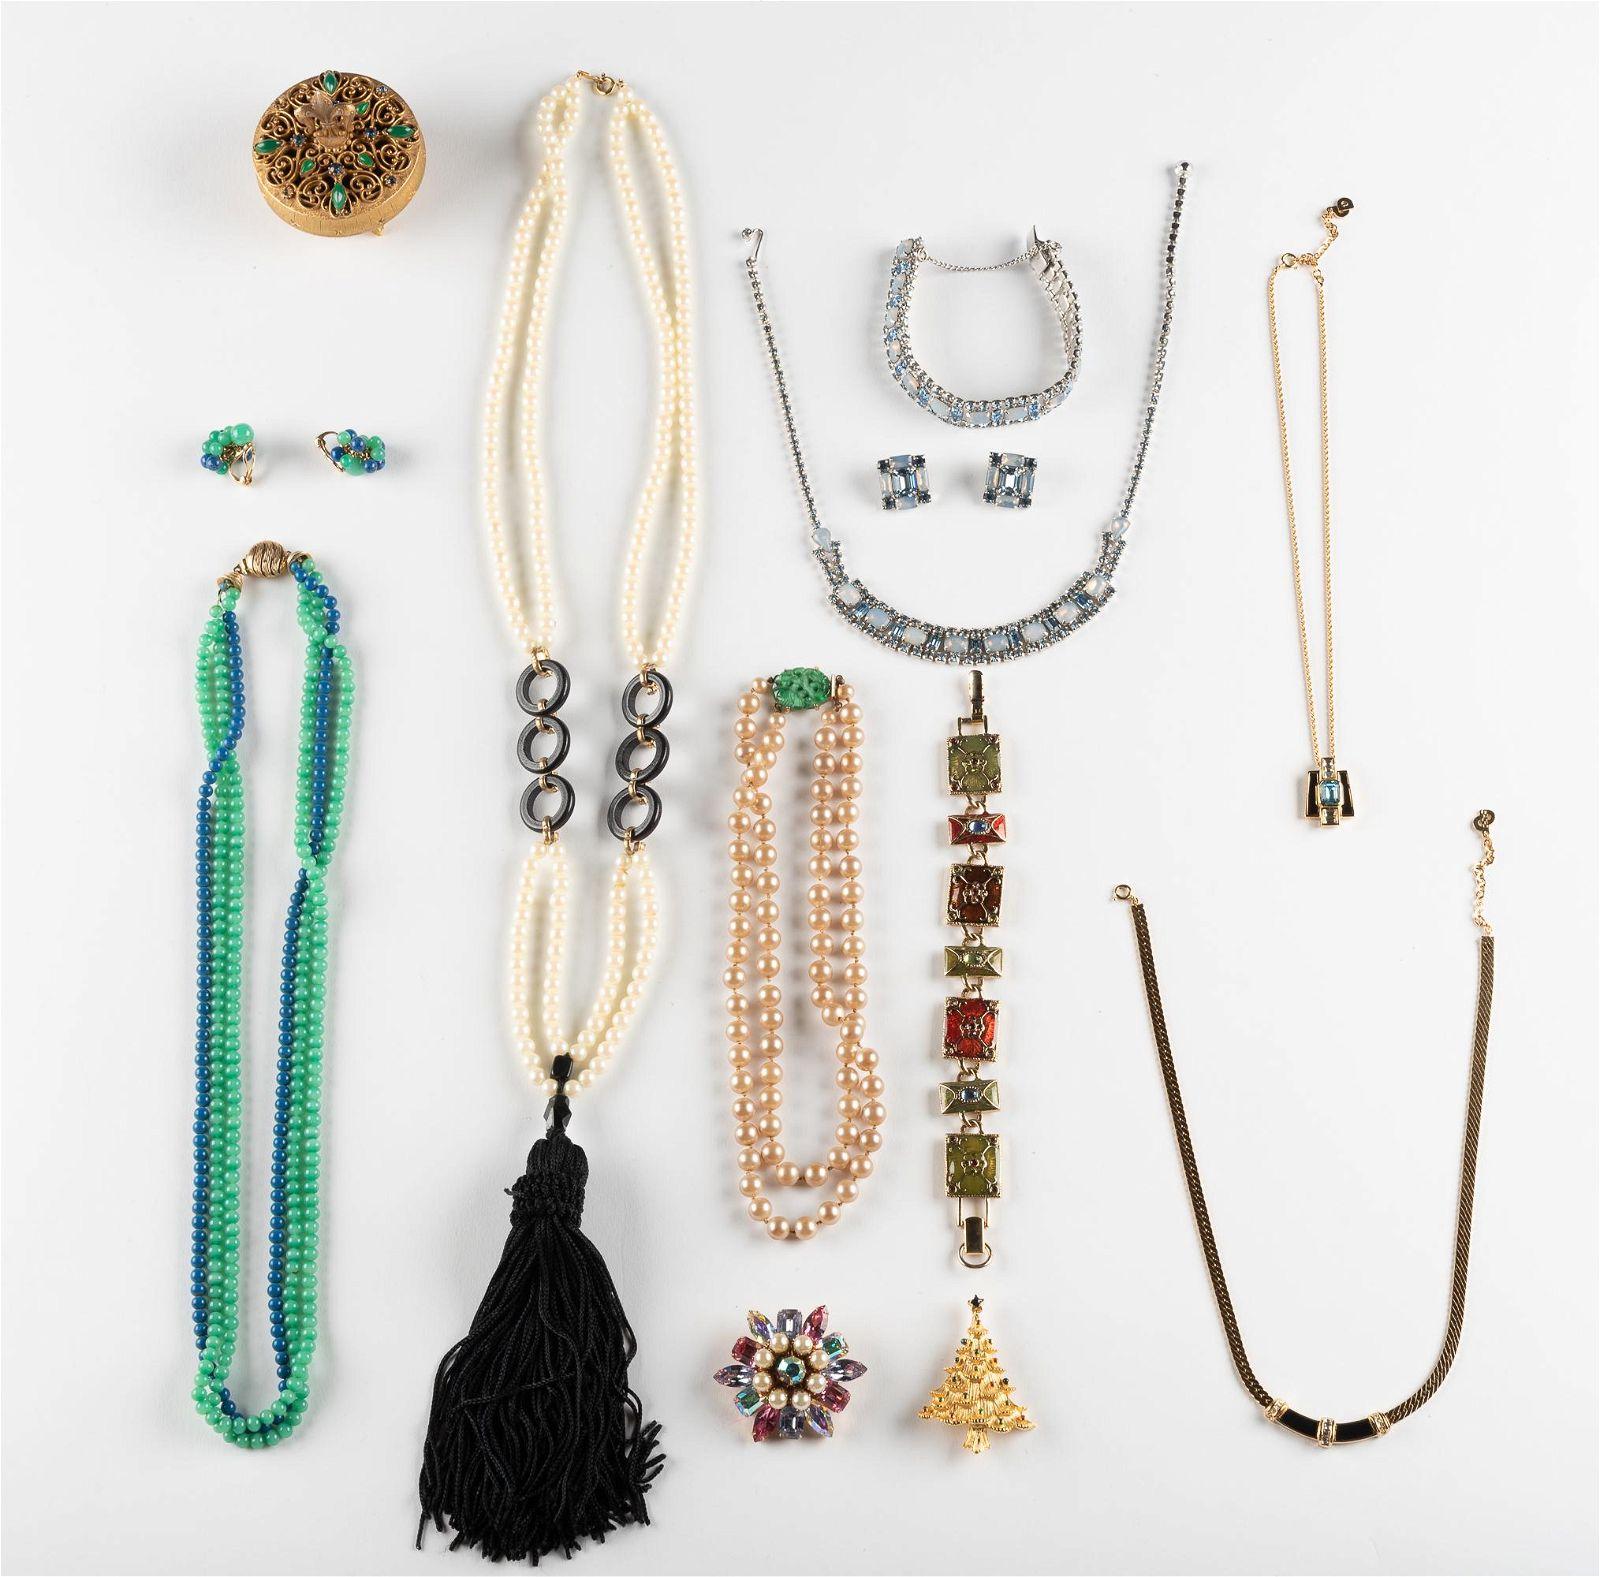 9 Pcs Costume Jewelry